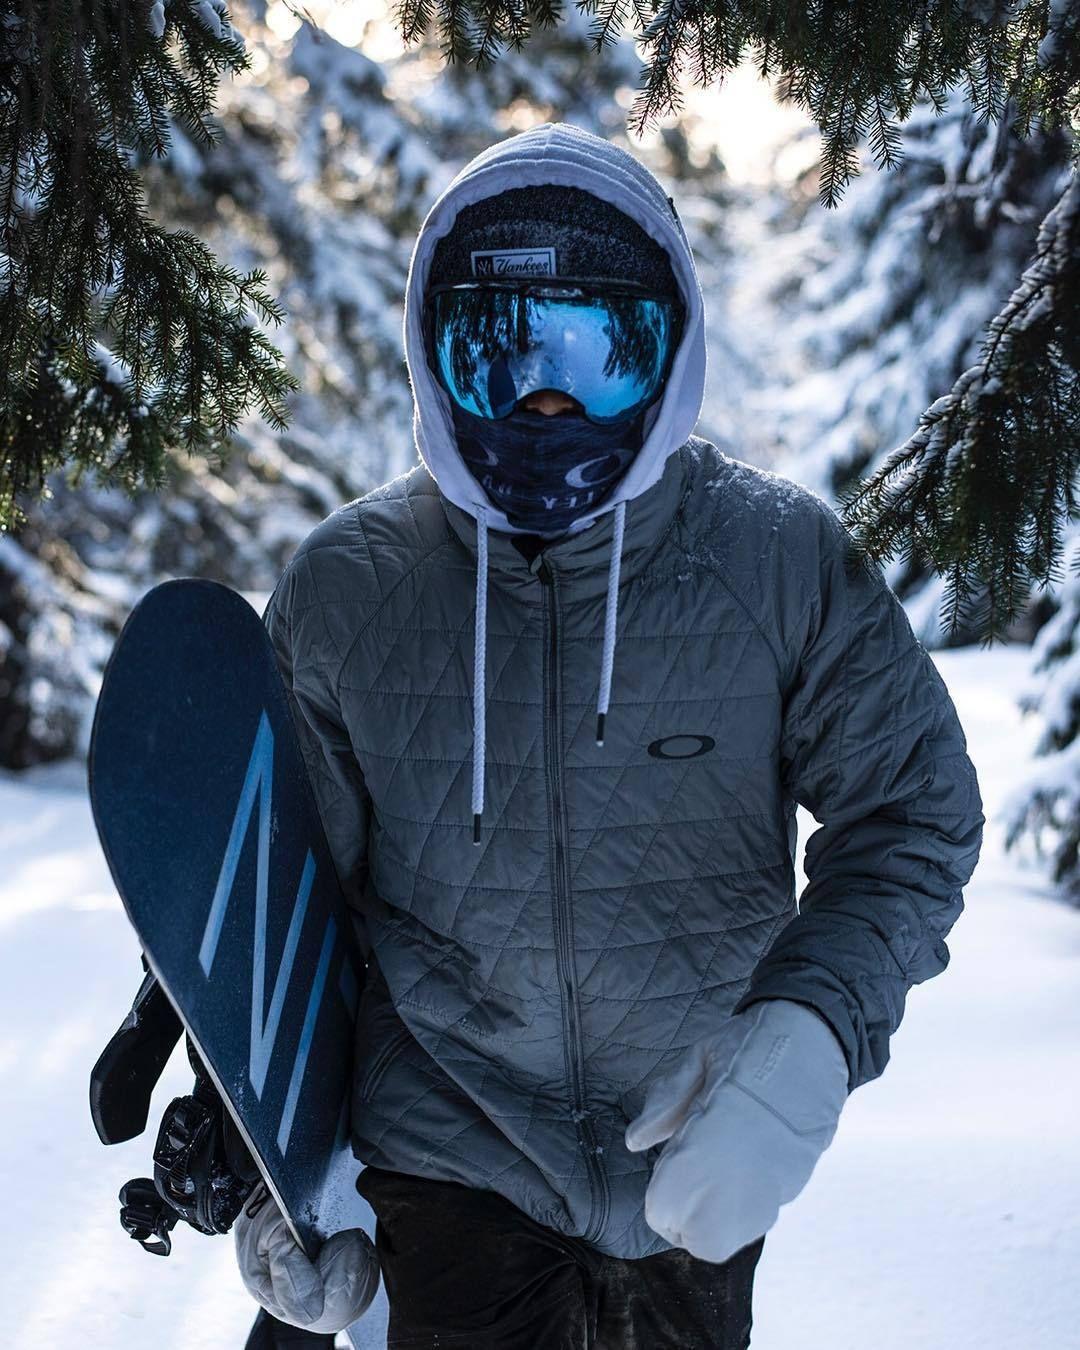 Sven Thorgren Photo Bernstal Snowboarding Outfit Snowboarding Snowboarding Photography